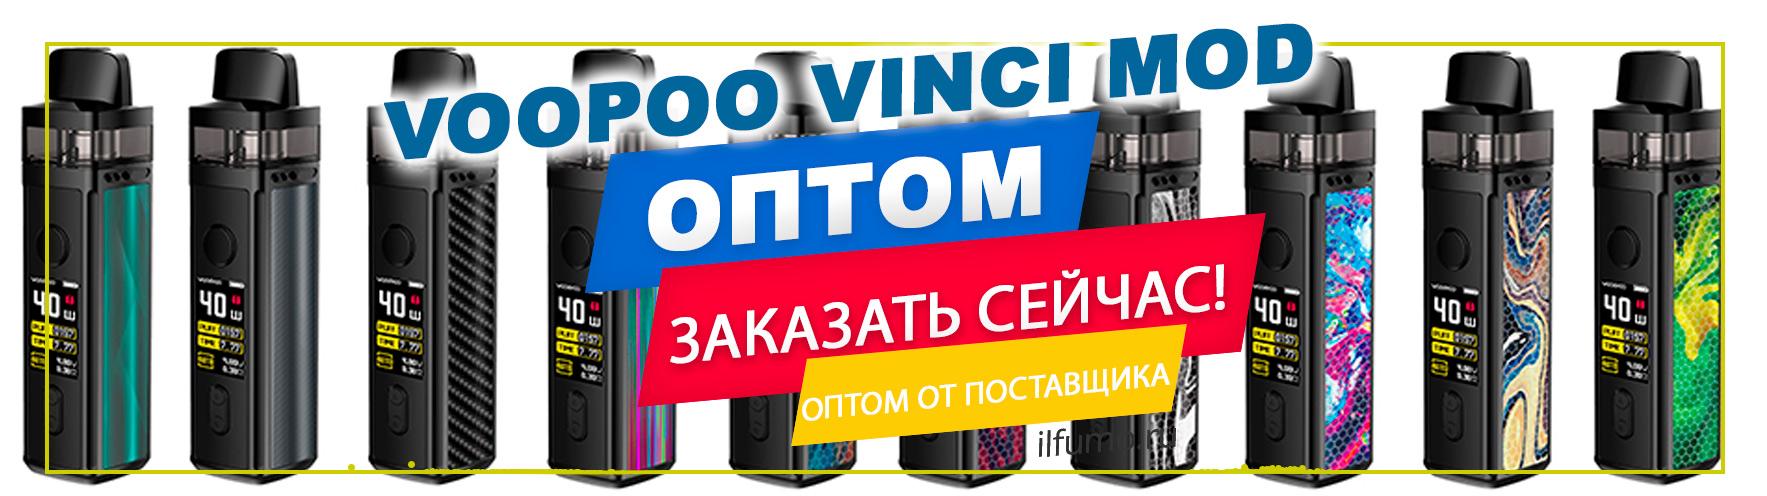 voopoo vinci mod pod kit 40w - Voopoo VINCI Mod Pod Kit 40W